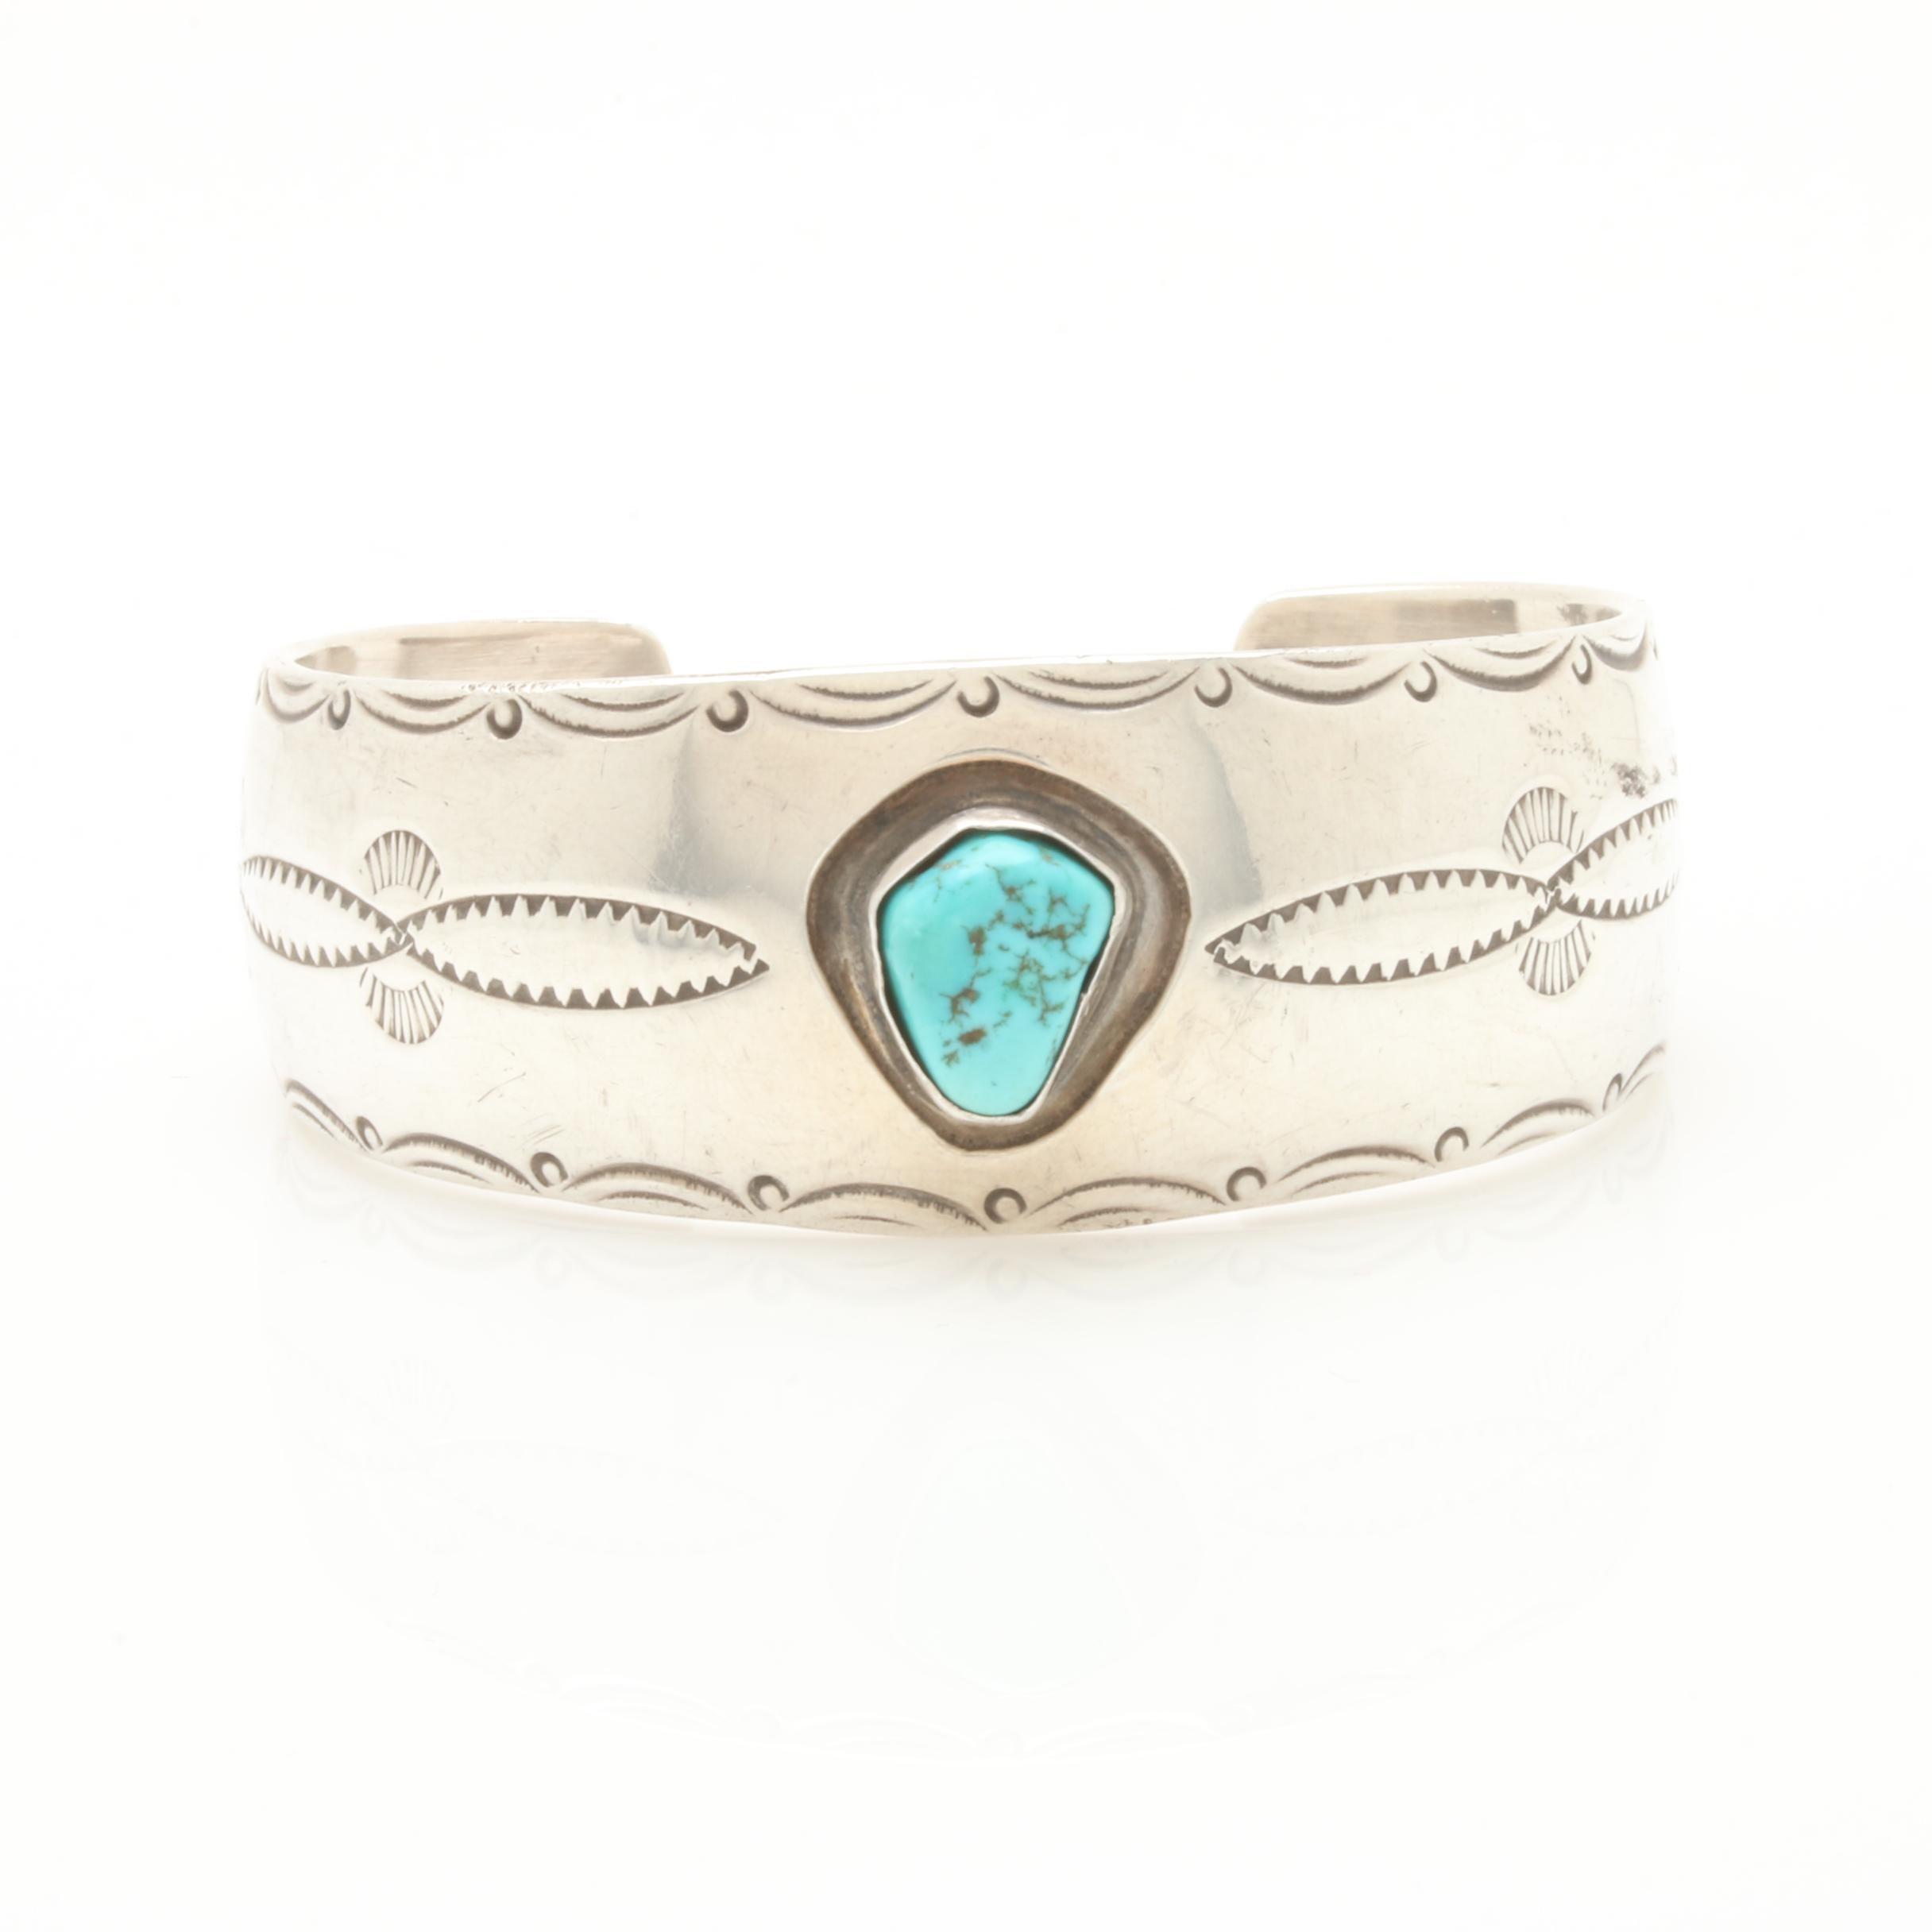 Elsie Yazzie Navajo Diné Sterling Silver Turquoise Bracelet